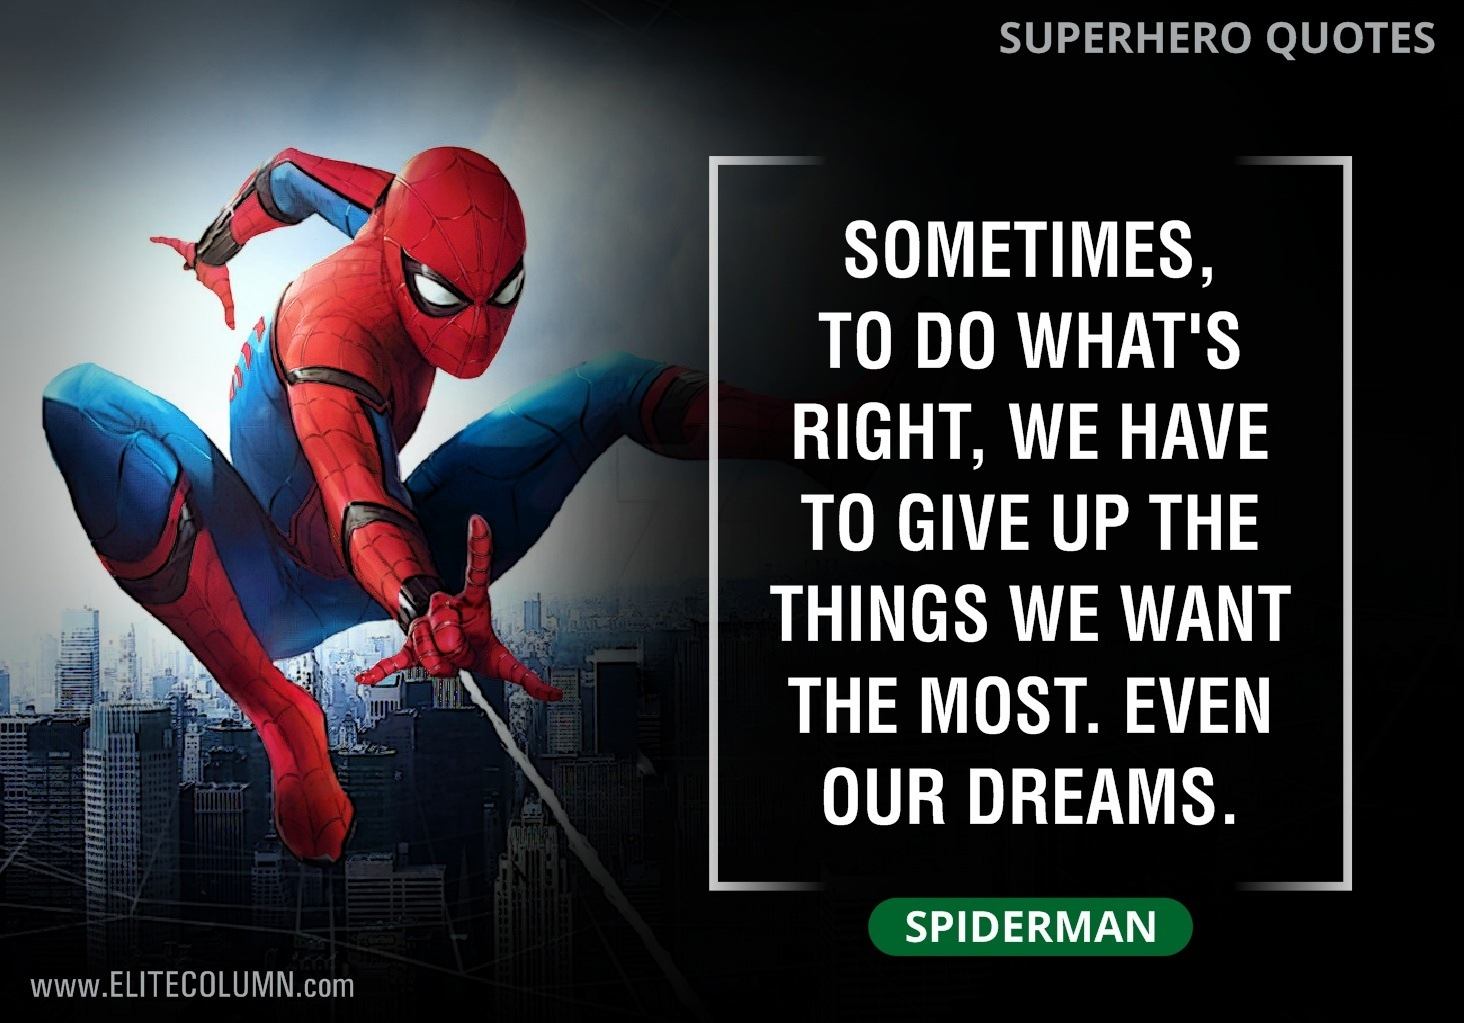 What Is The Best Superhero Movie Quote Quora